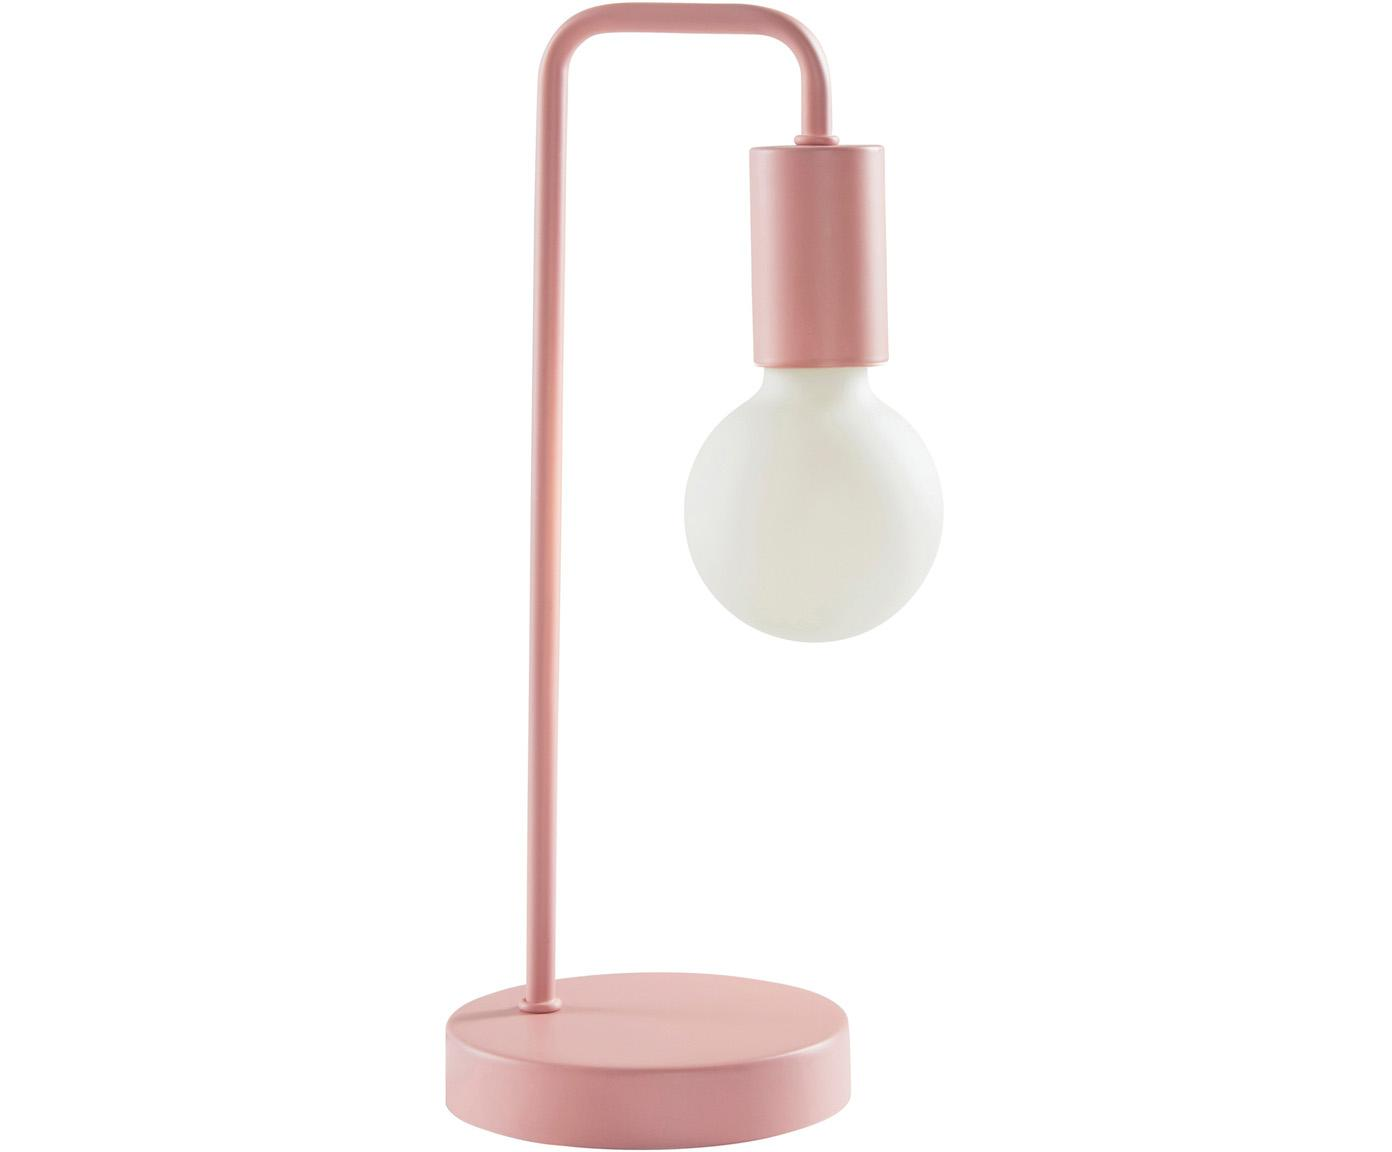 Lámpara de mesa Cascais, Pantalla: metal recubierto, Cable: cubierto en tela, Rosa, Ø 14 x Al 35